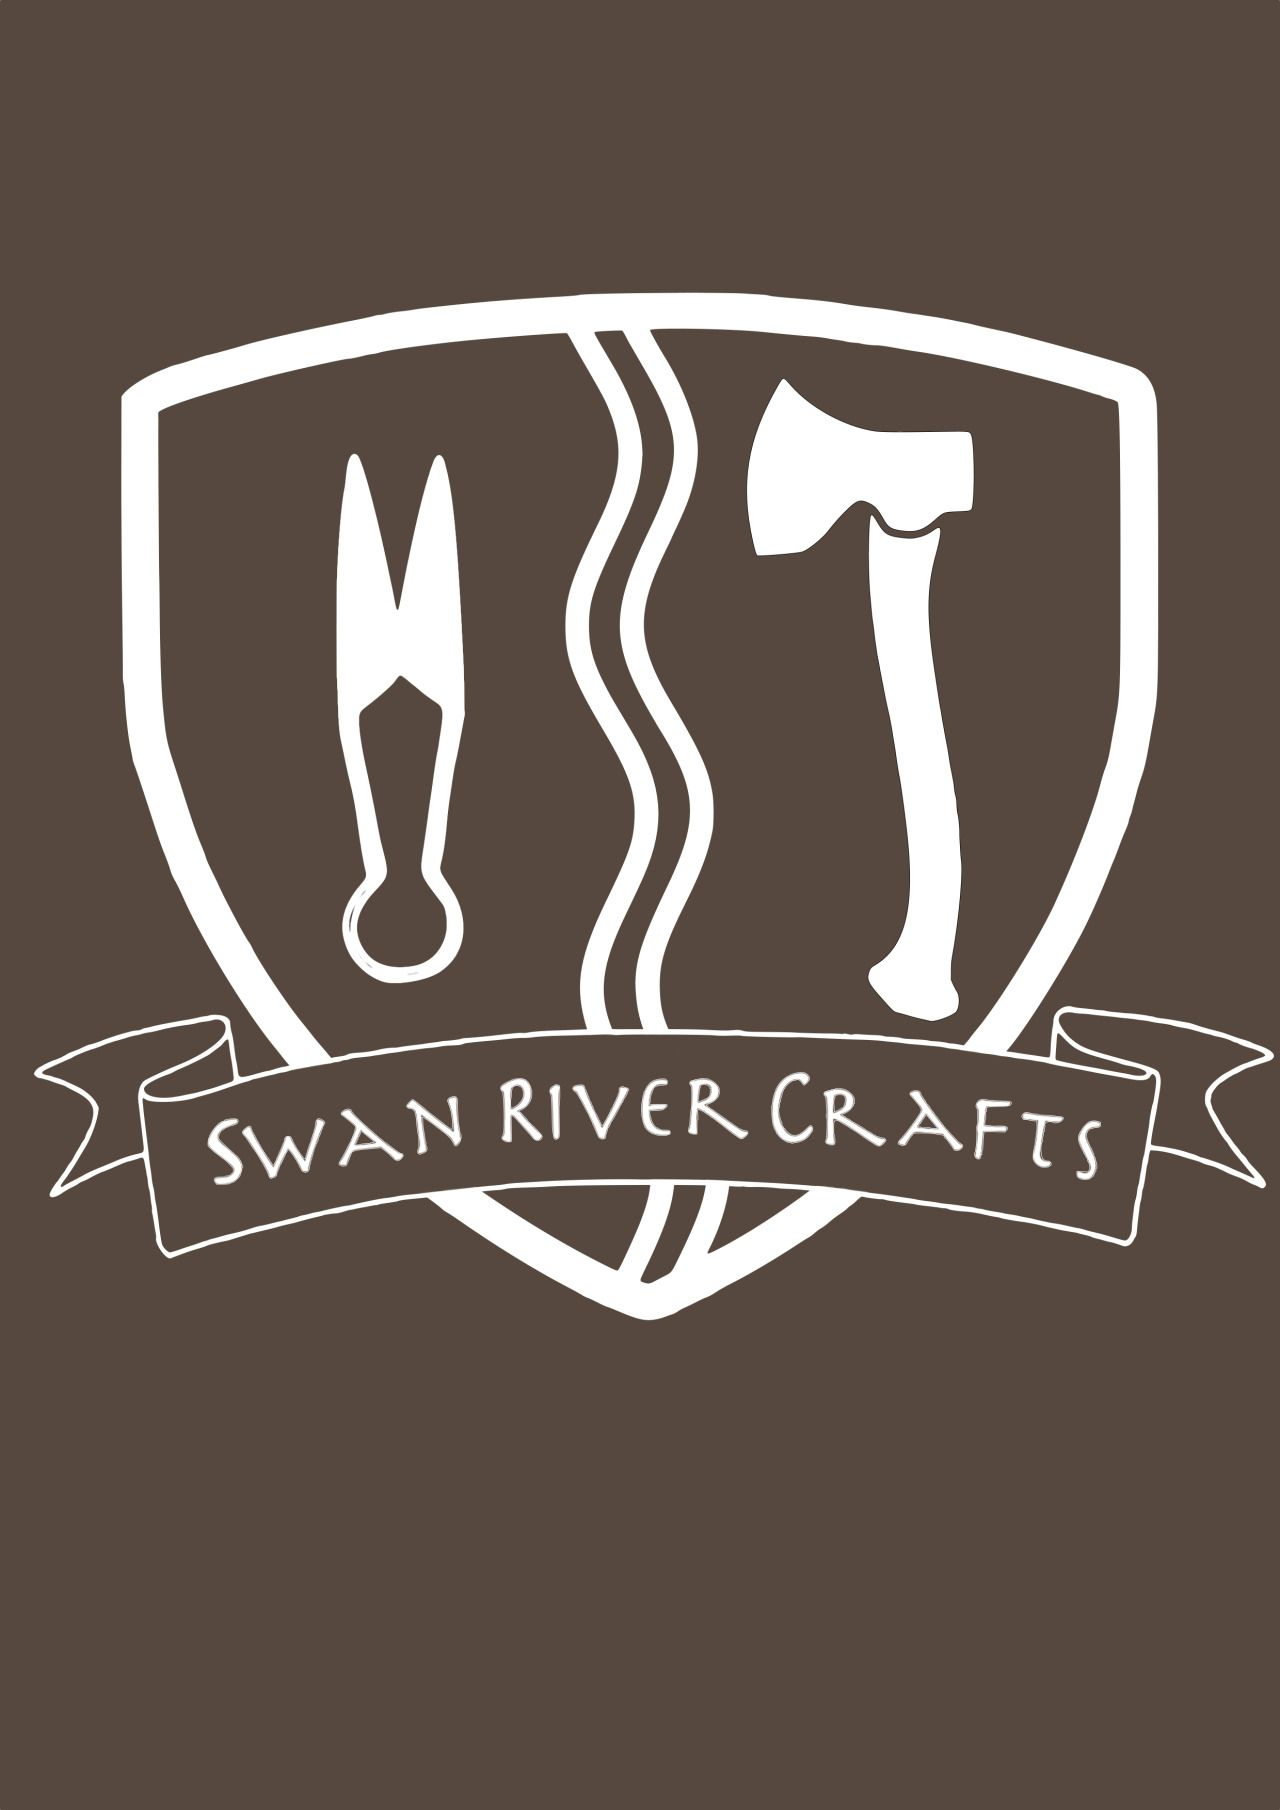 Suunittelin Swan River Craftille logon./ Designed a logo for Swan River Crafts.